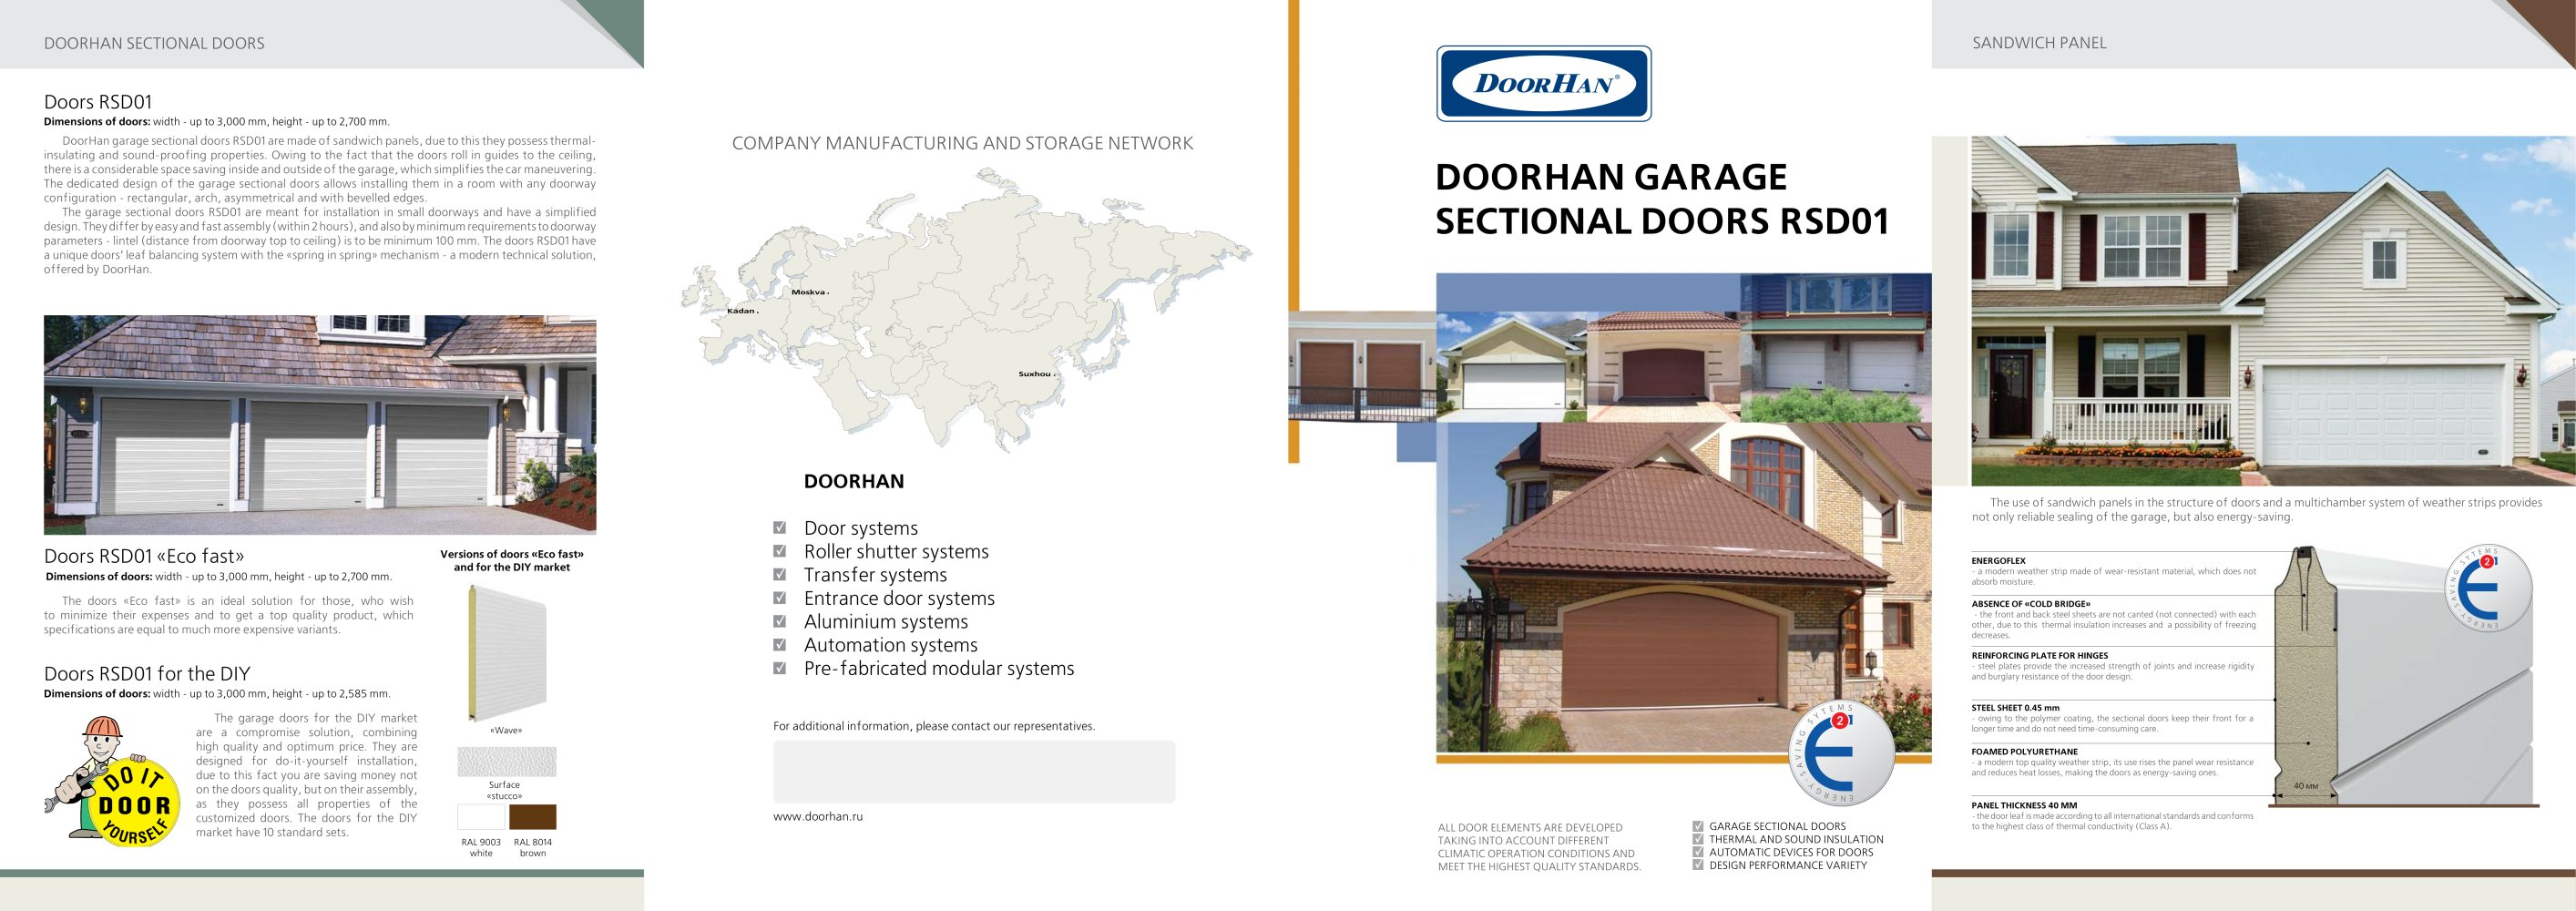 Leaflet doorhan garage sectional doors rsd01 doorhan pdf doorhan garage sectional doors rsd01 1 2 pages rubansaba